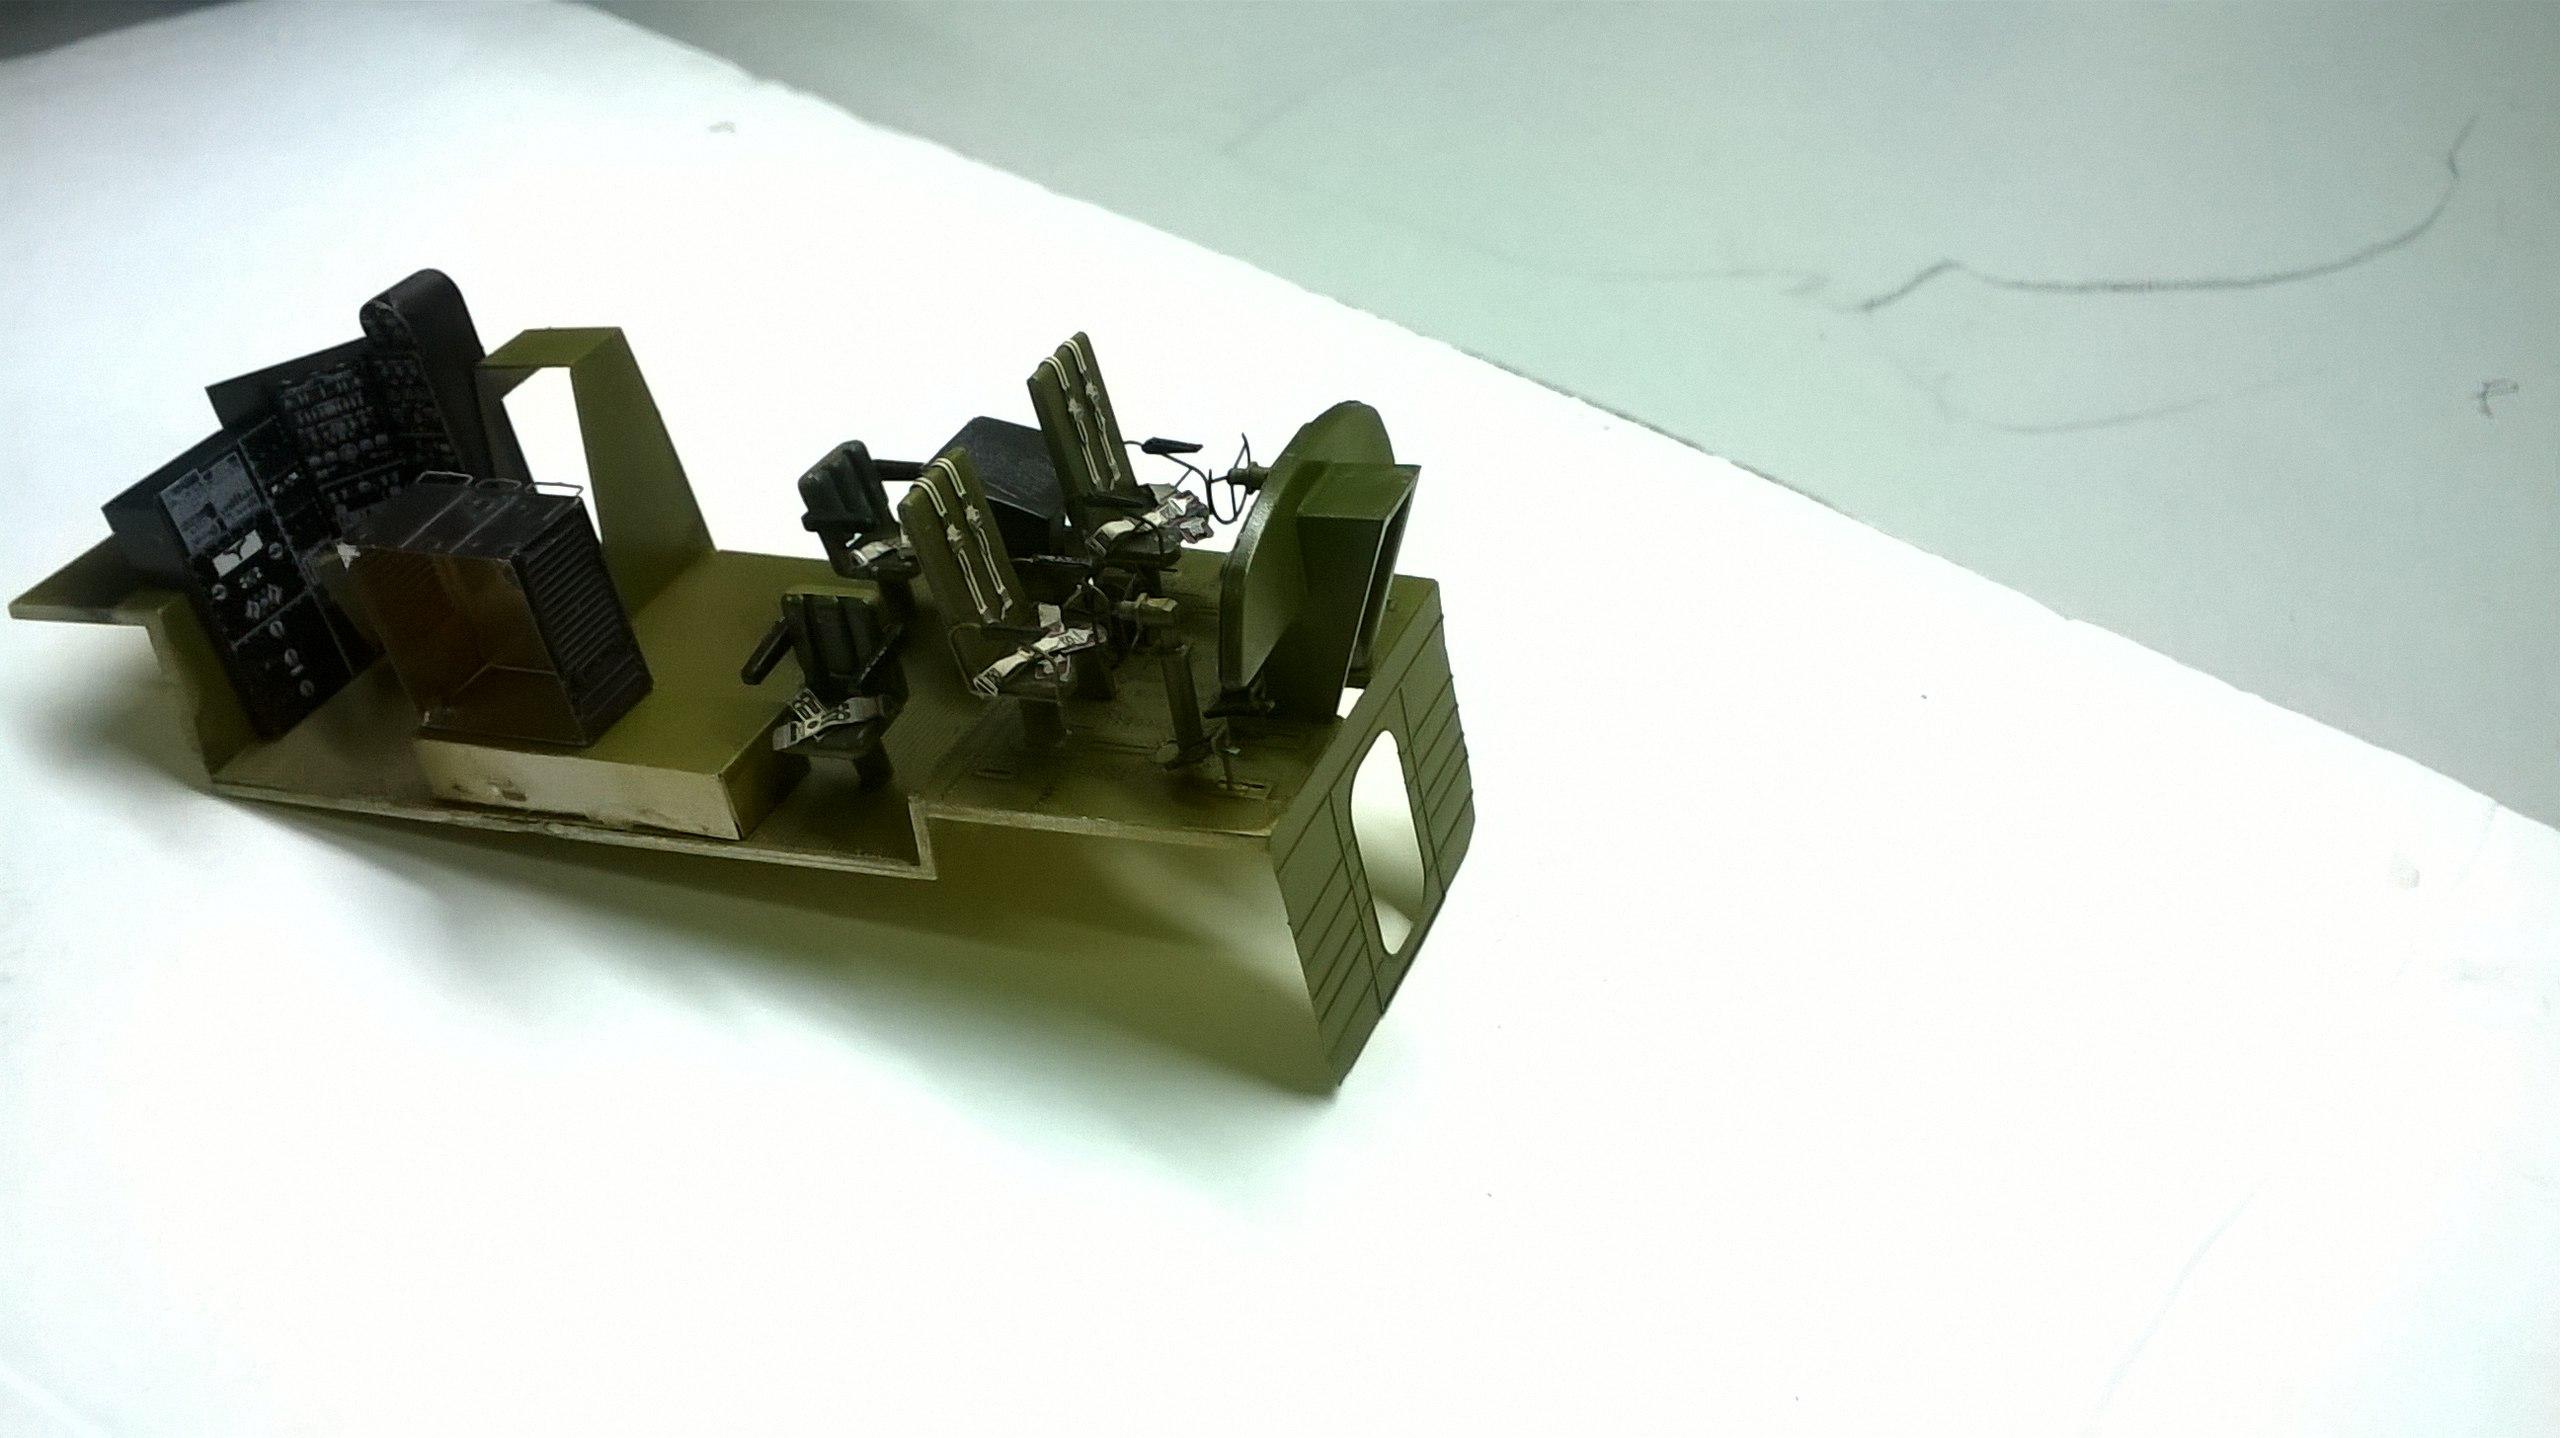 PBM-5 A MARINER 1/72 (MINICRAFT) Ys2liGKVIh0